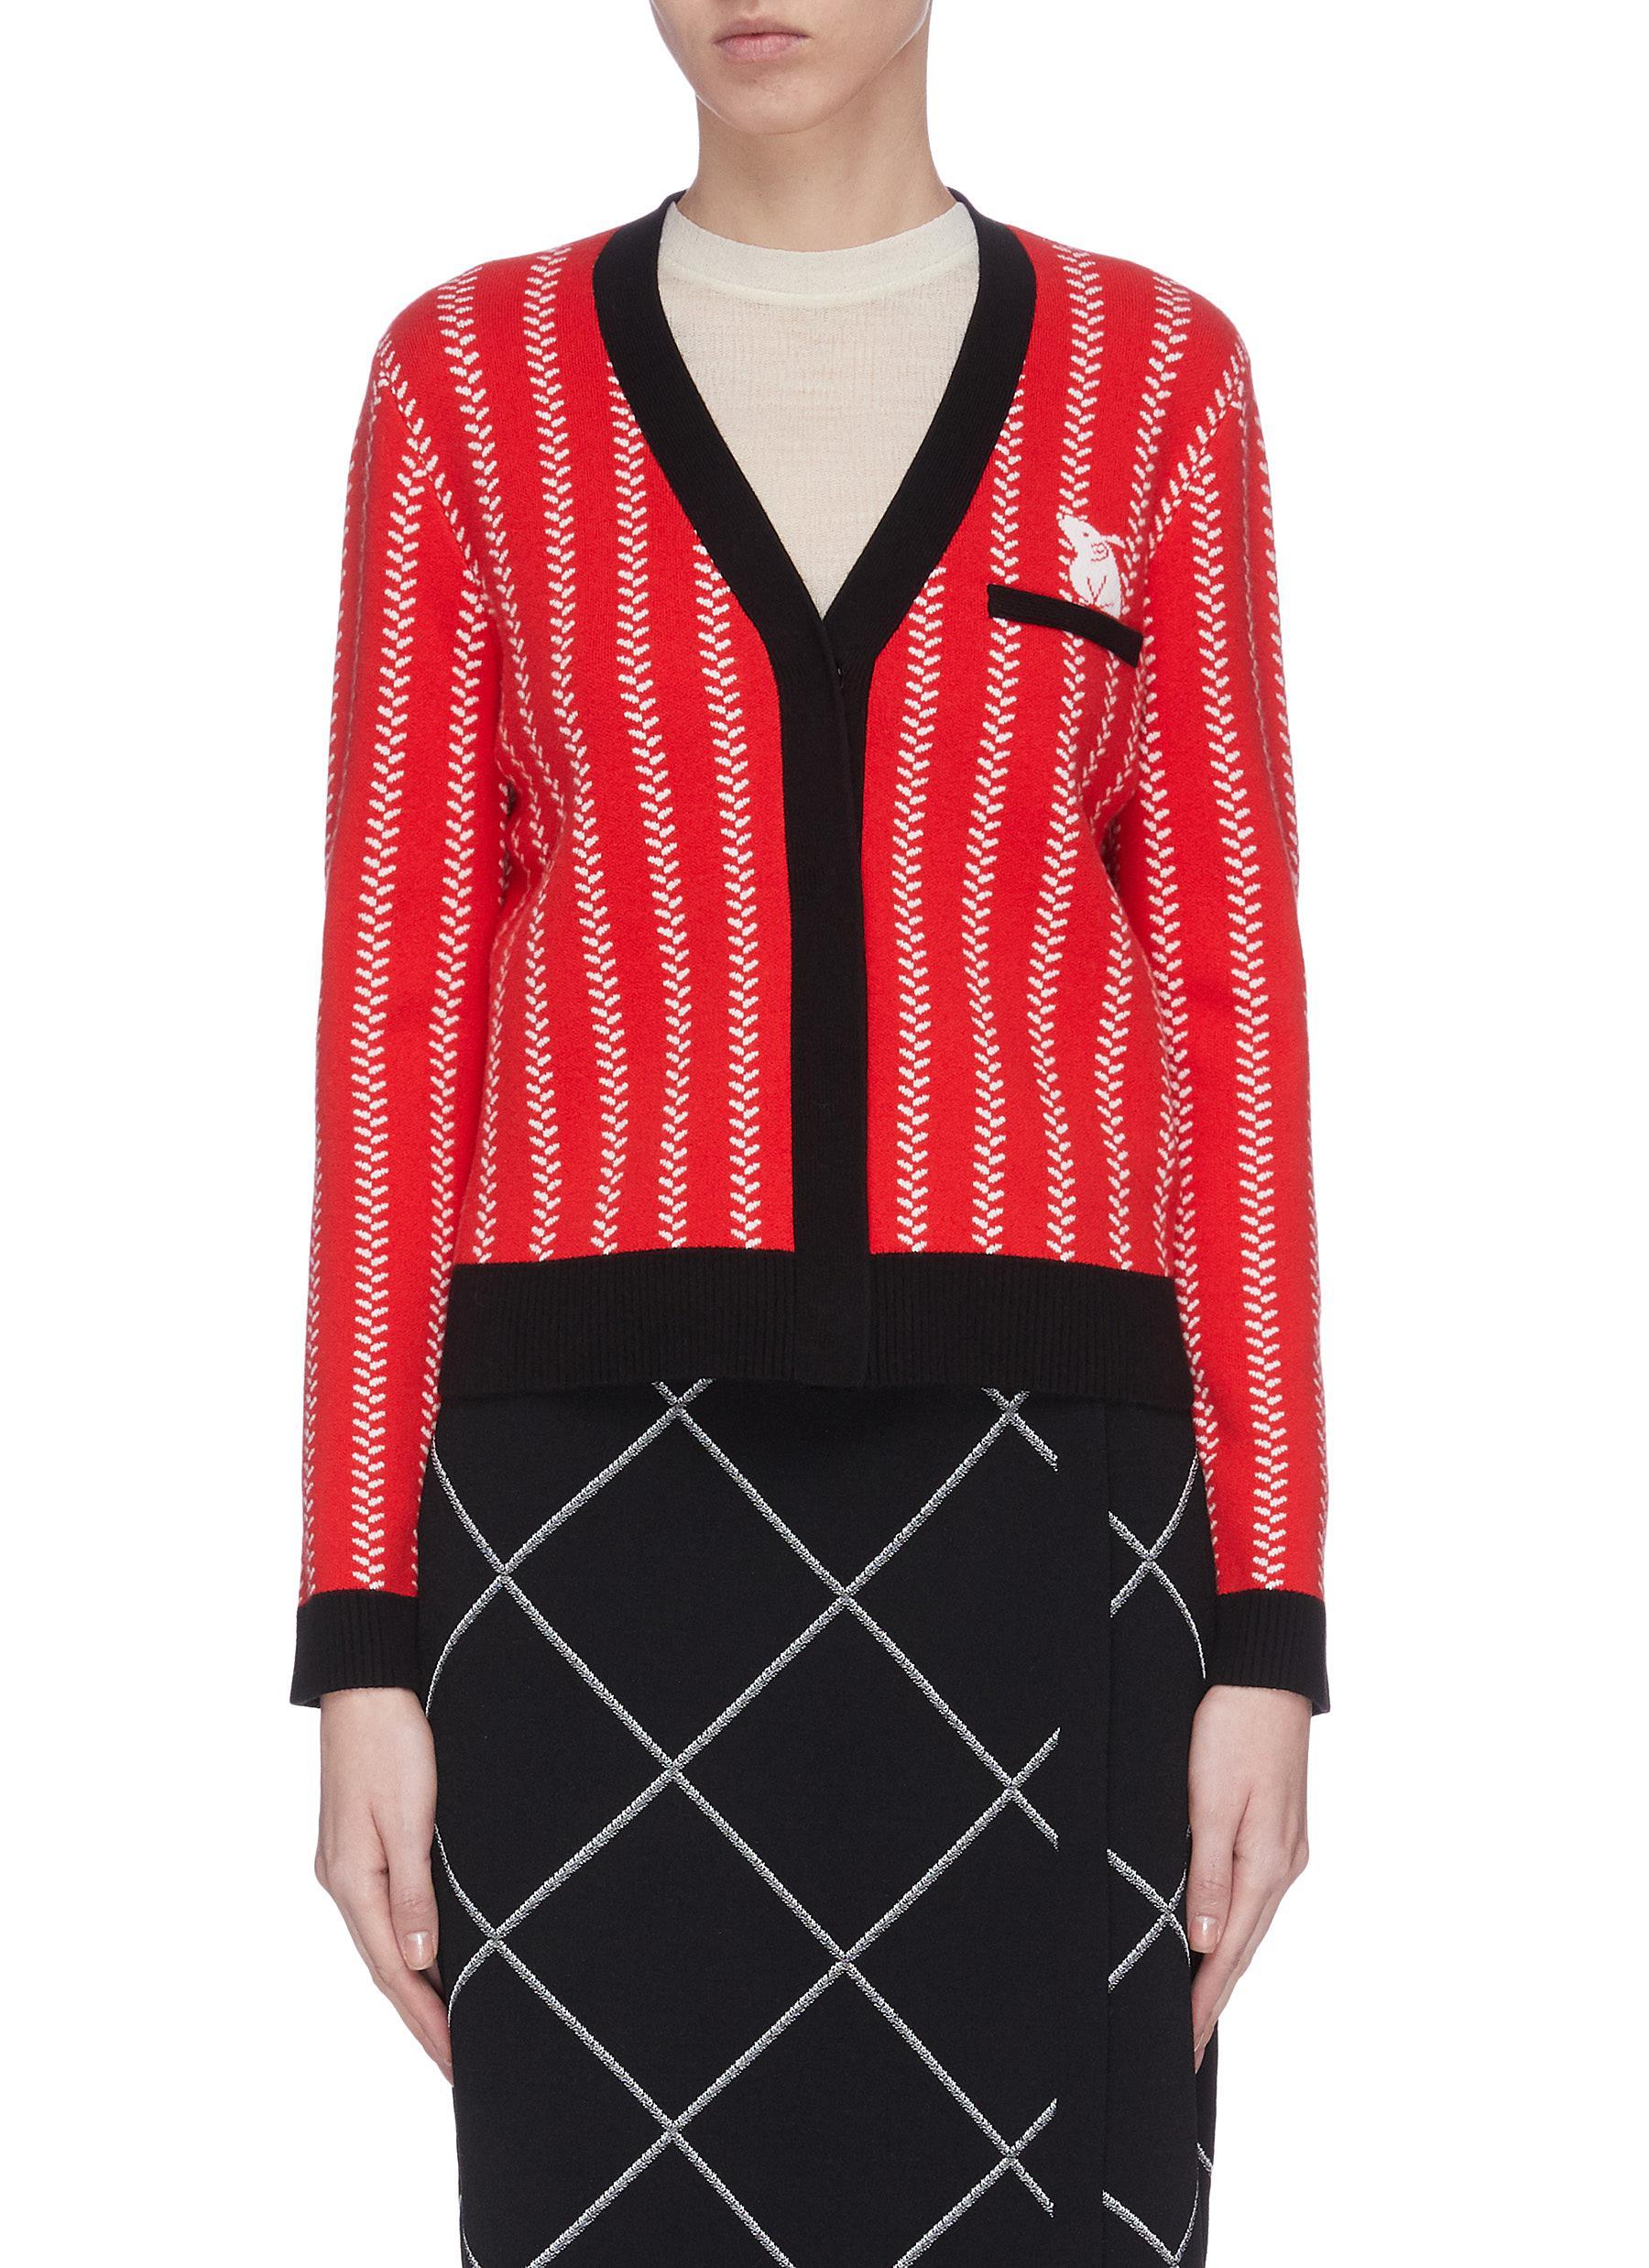 Buy Ph5 Knitwear Rat motif cardigan